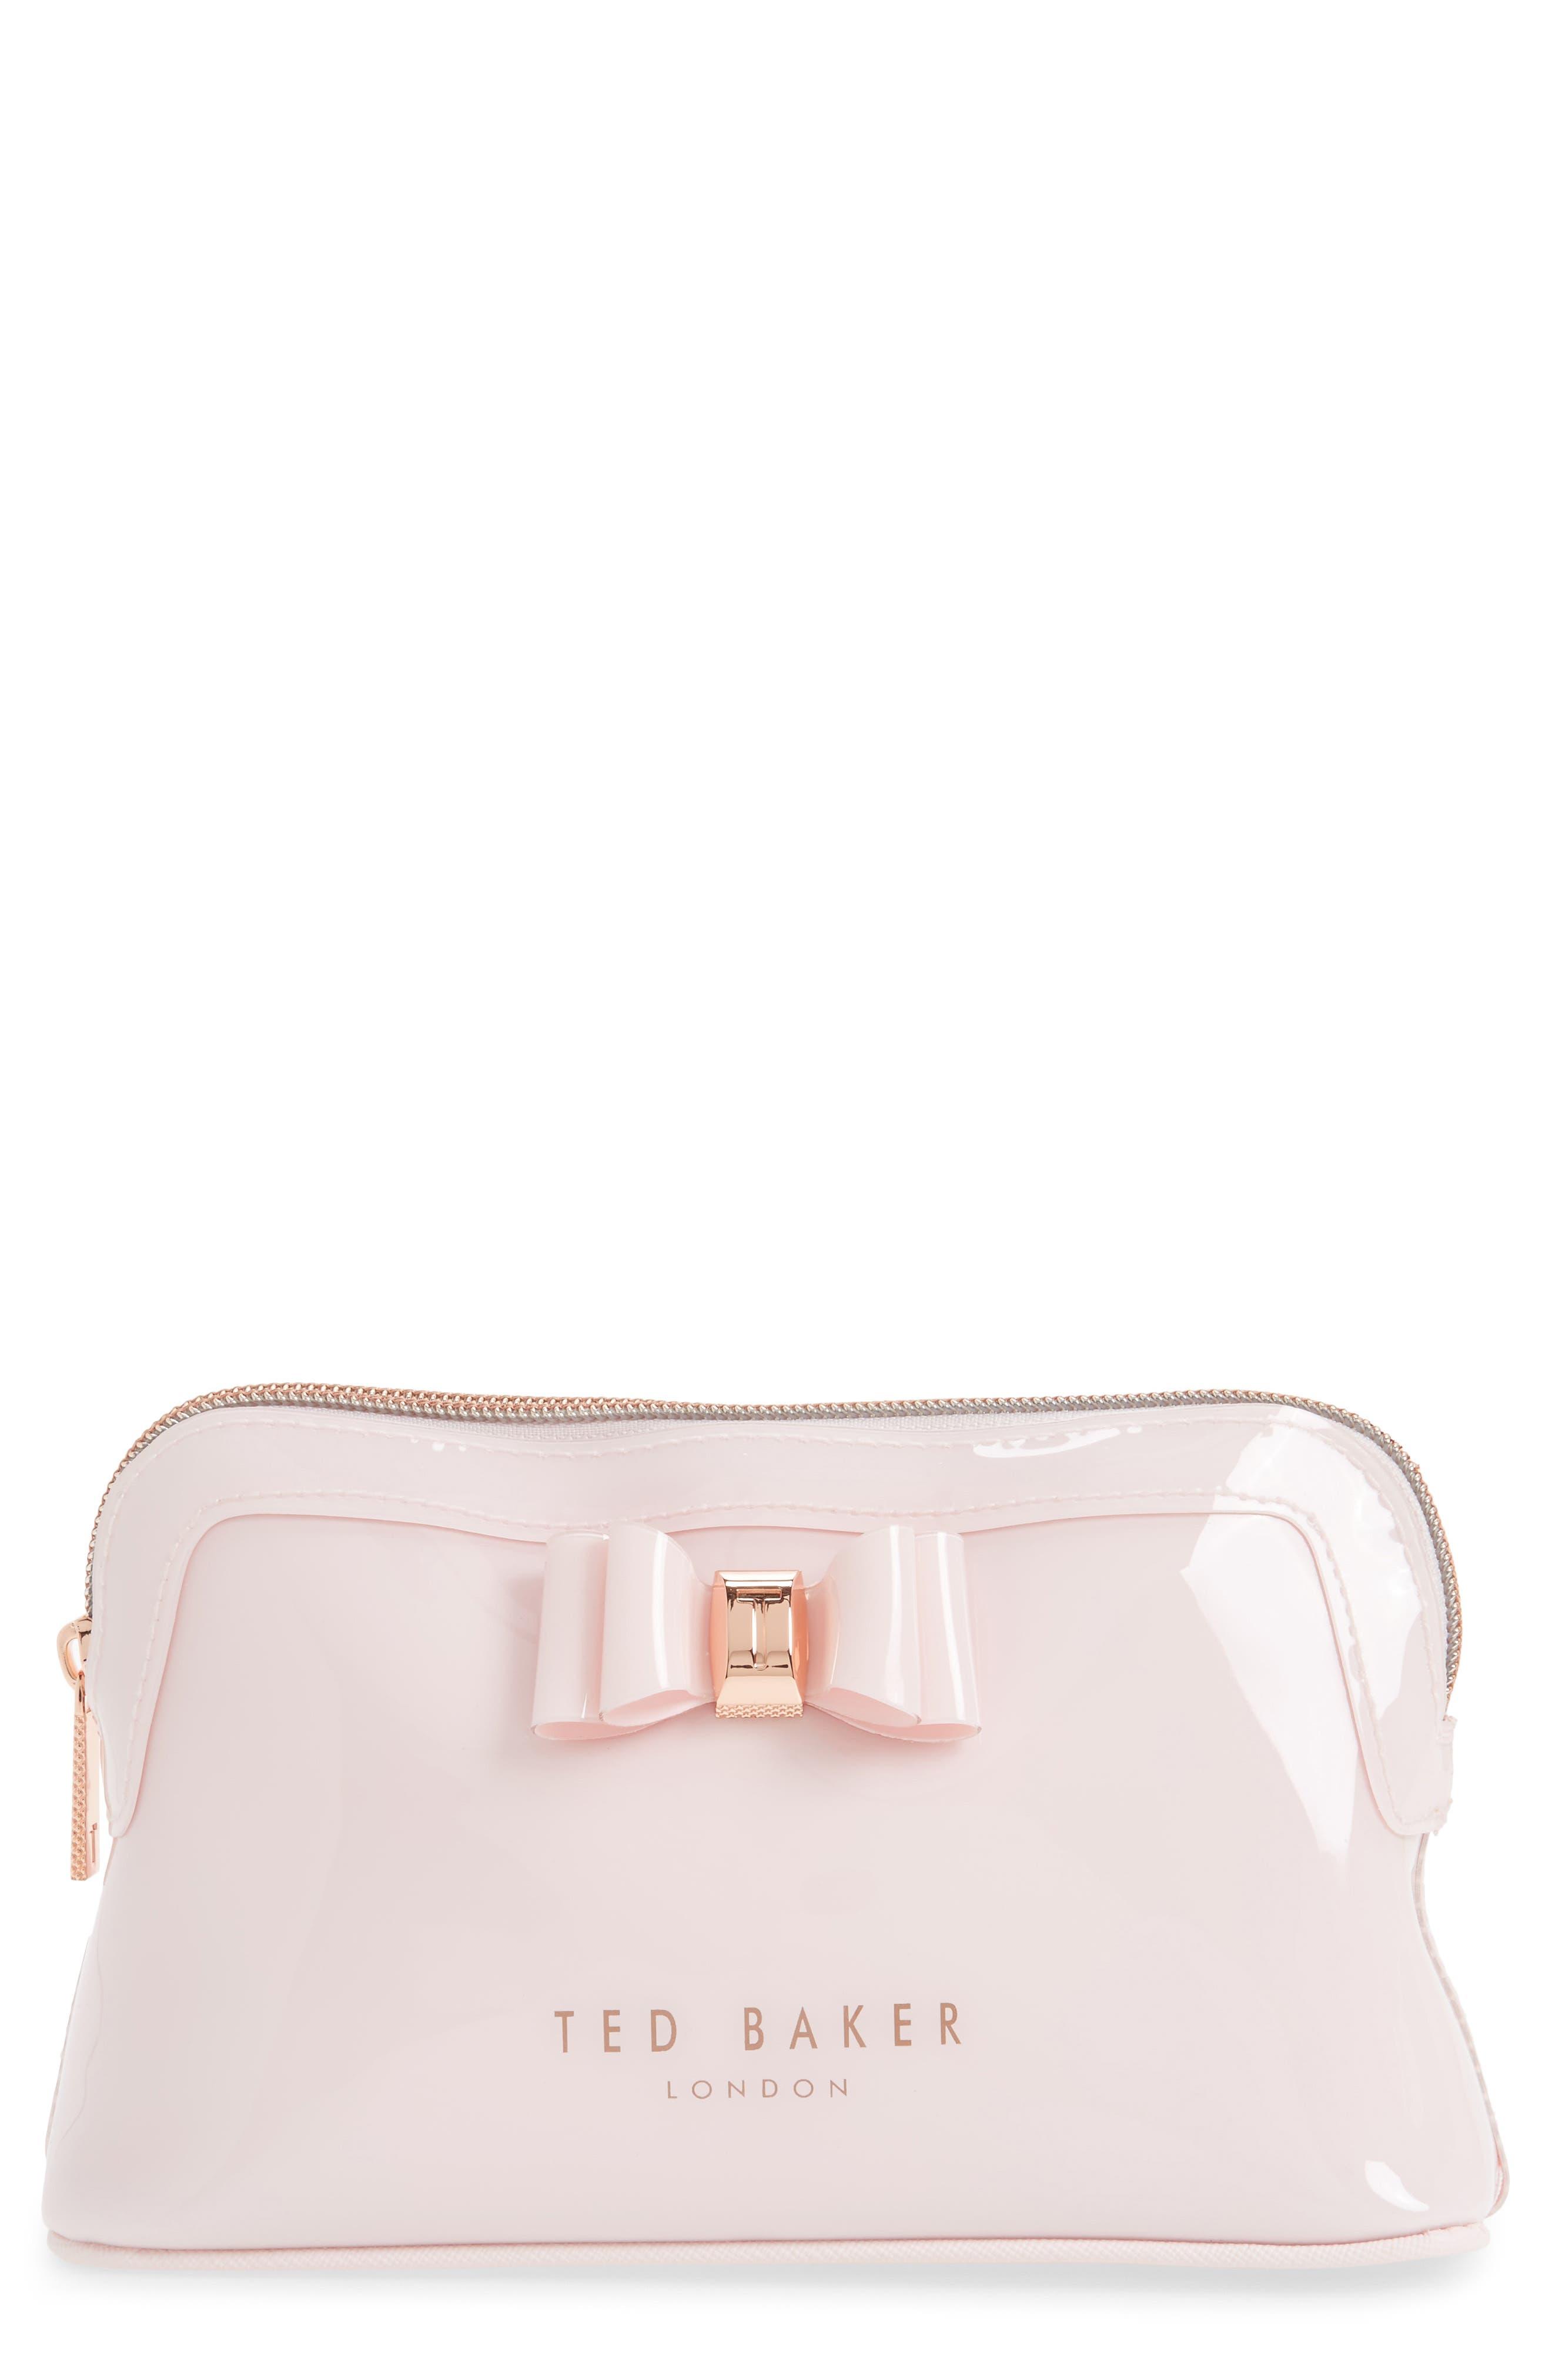 Julis Bow PVC Cosmetics Case,                             Main thumbnail 1, color,                             Dusky Pink